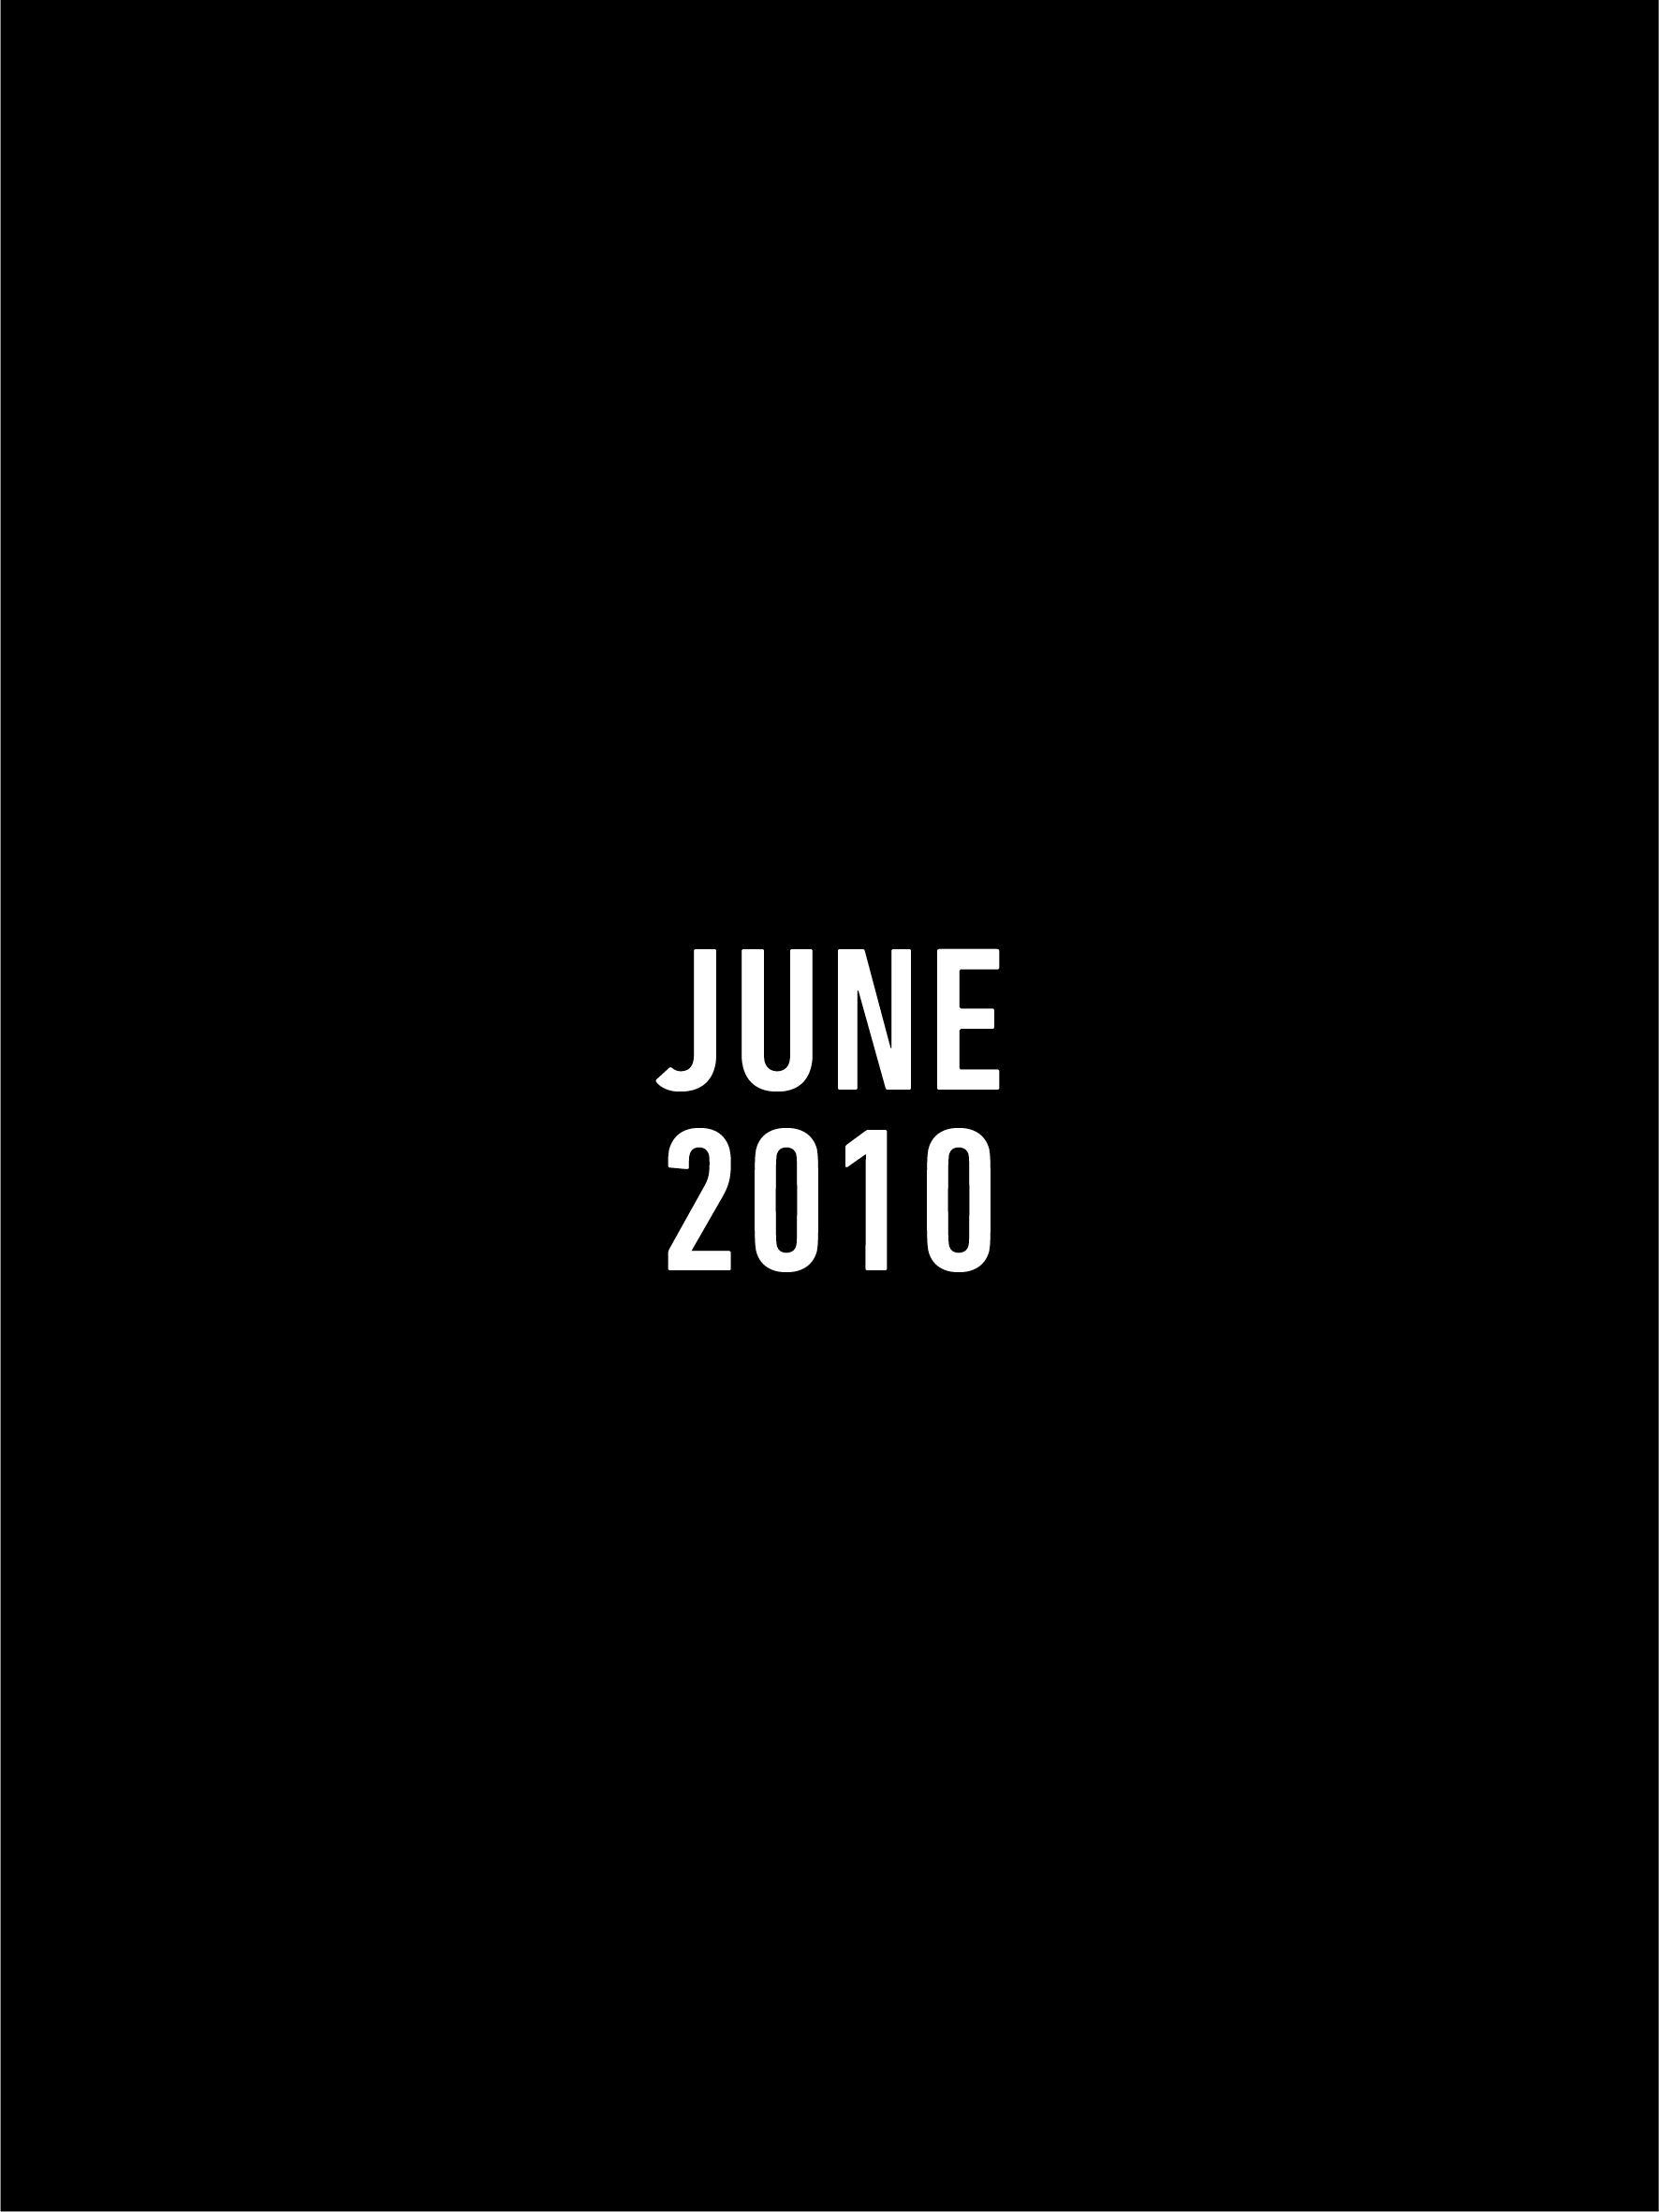 2010 monthly6.jpg